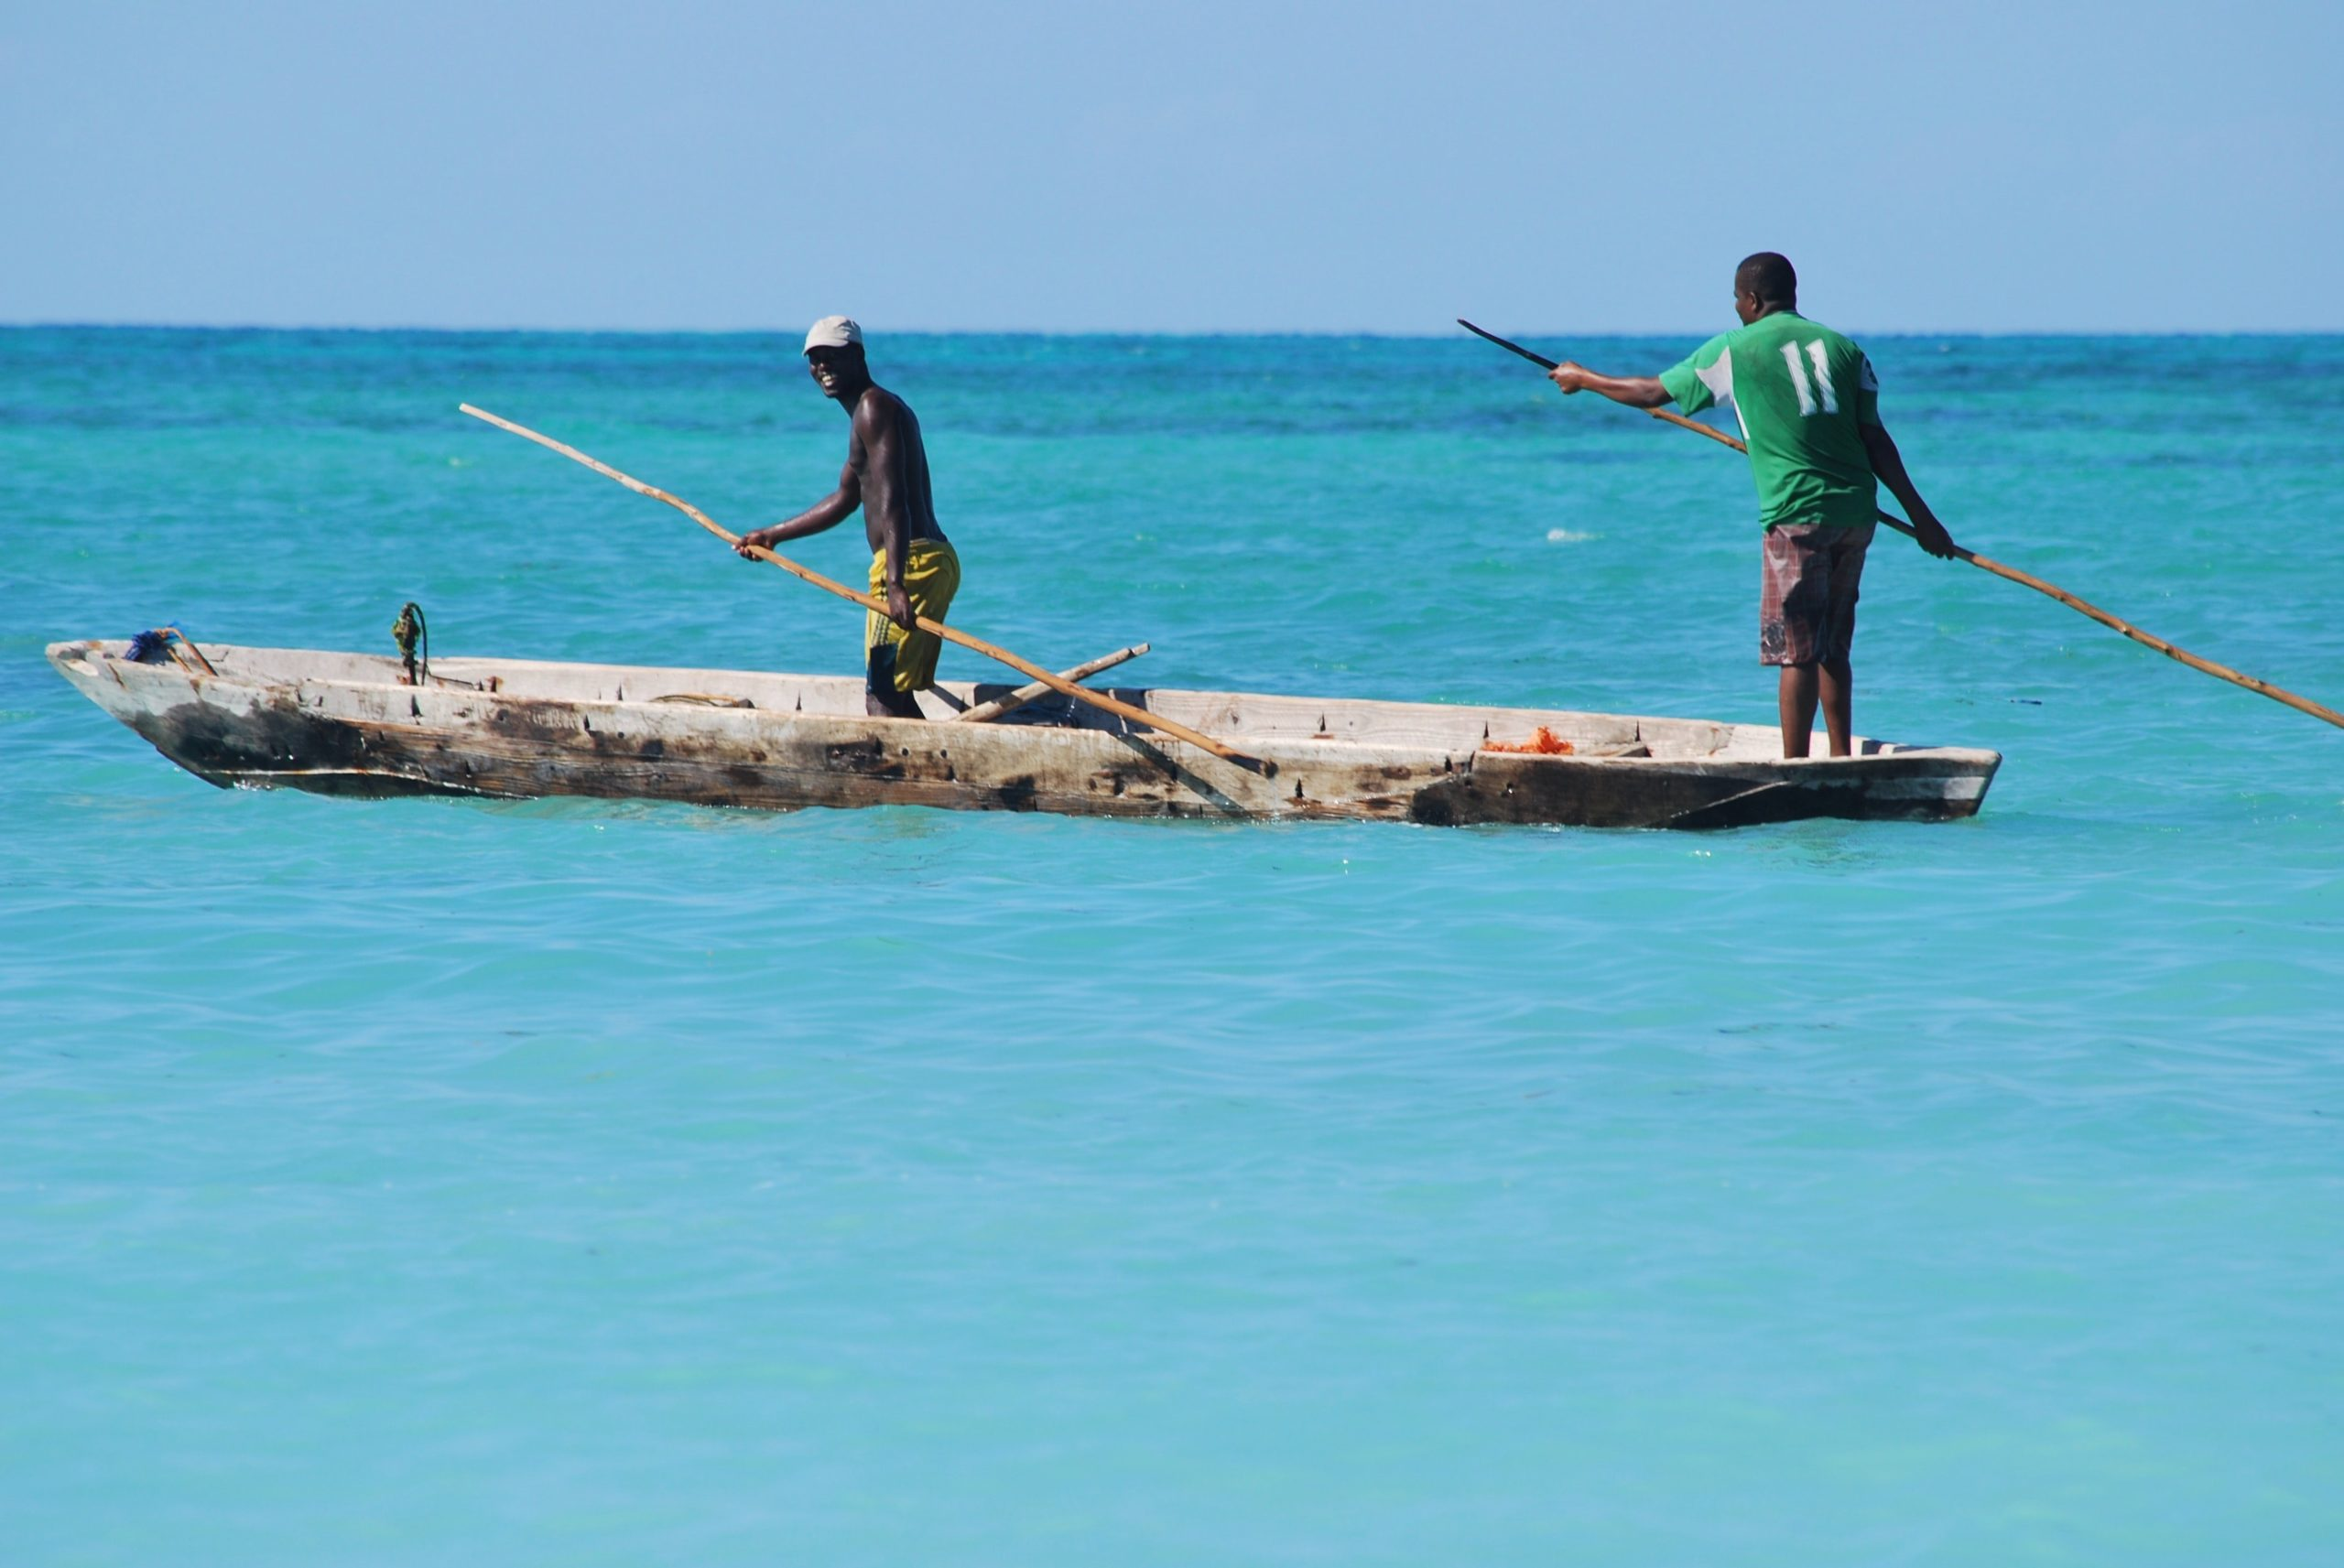 Men fishing in the turquoise waters of Zanzibar.